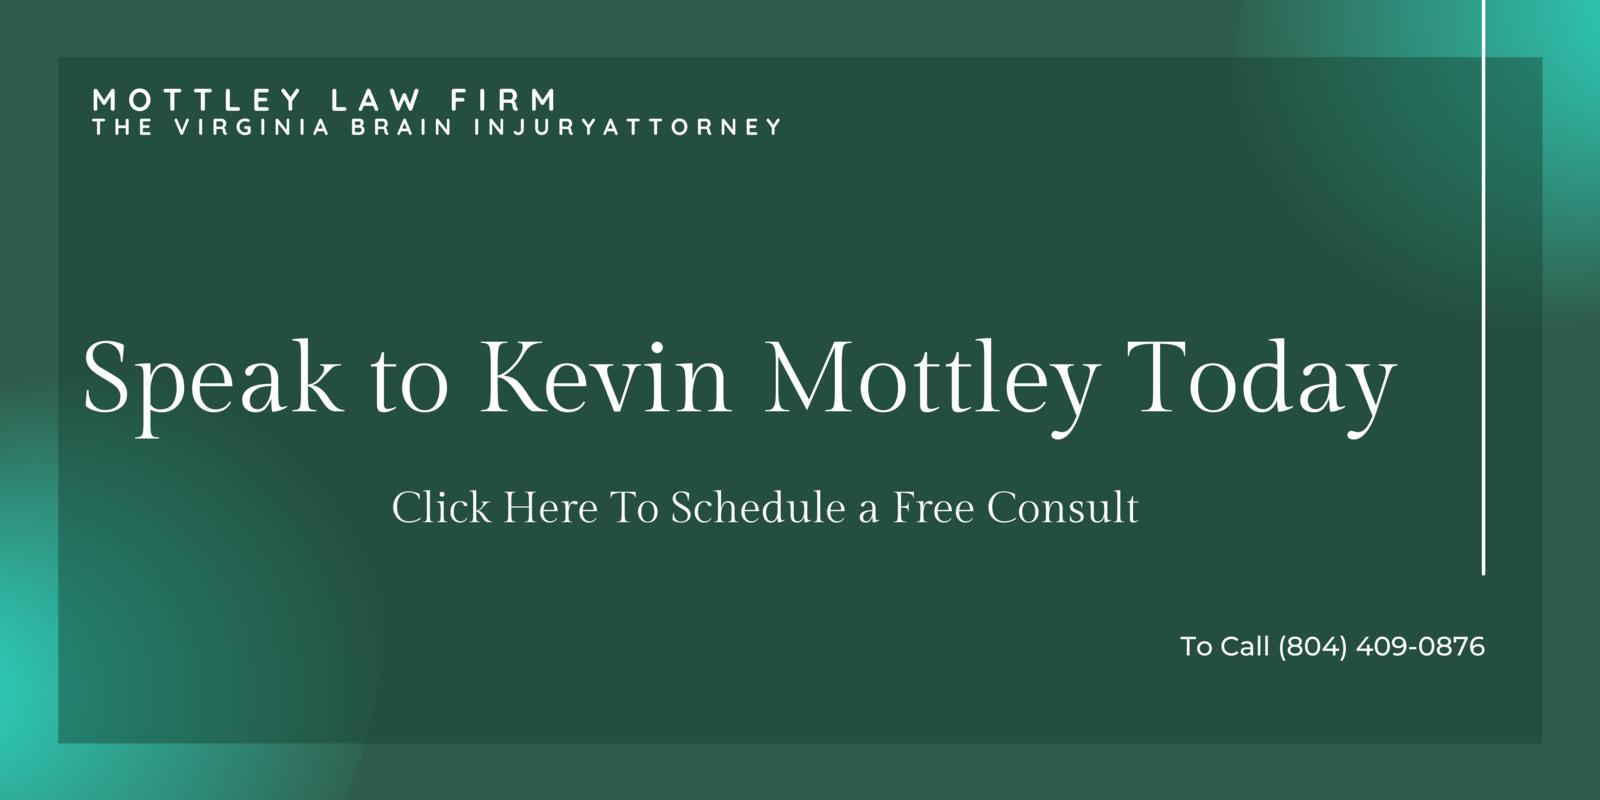 Richmond VA Brain Injury Attorney - Free Consultations